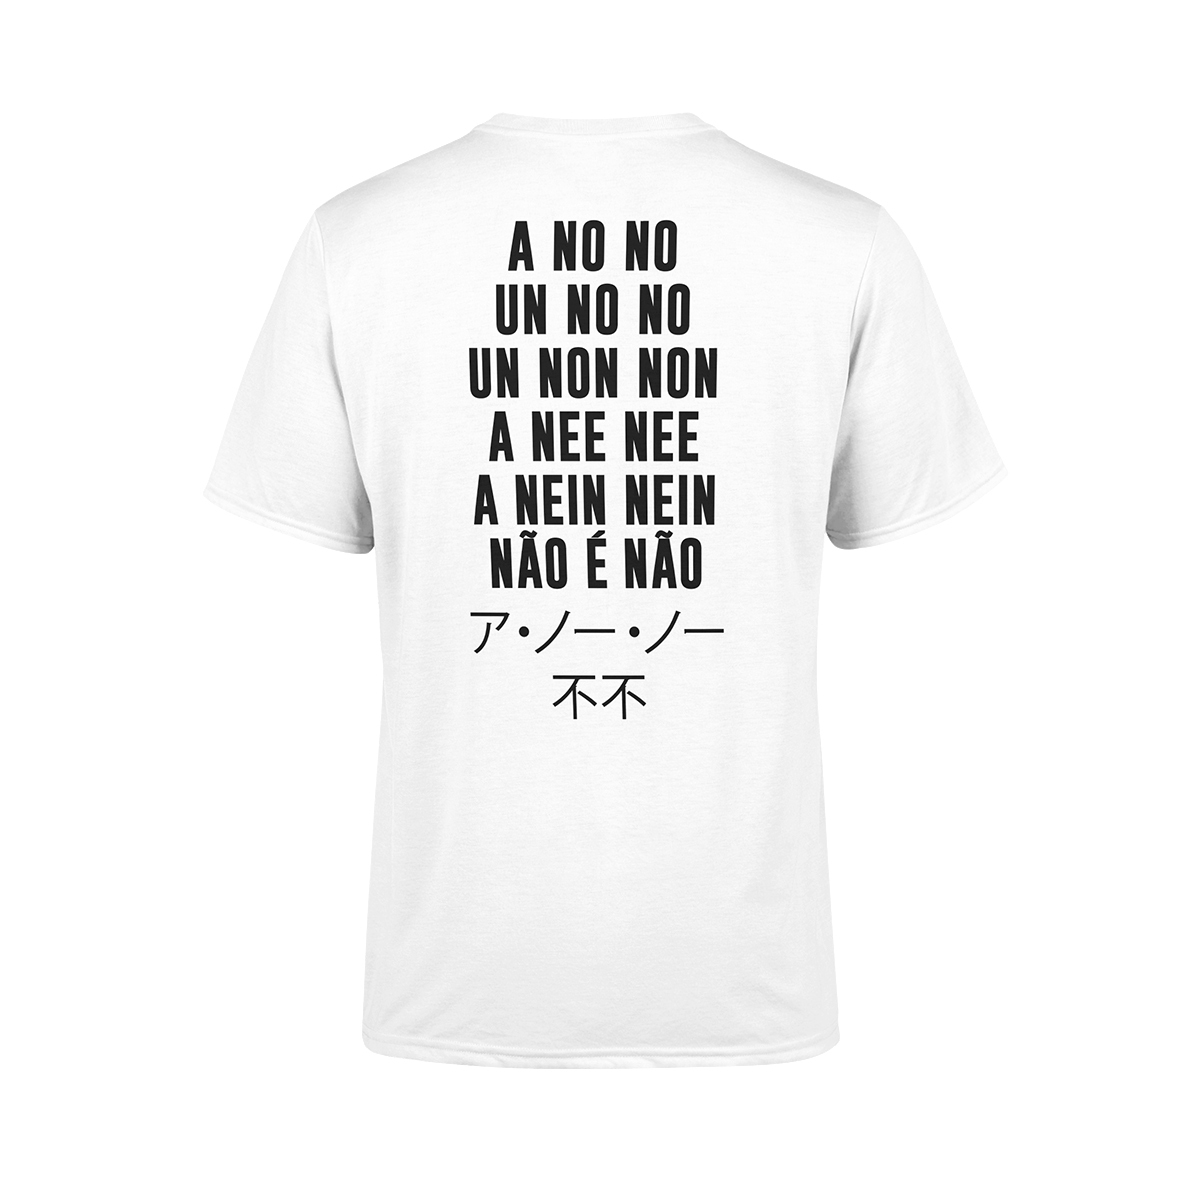 """That's a No No"" T-Shirt + Caution Download"